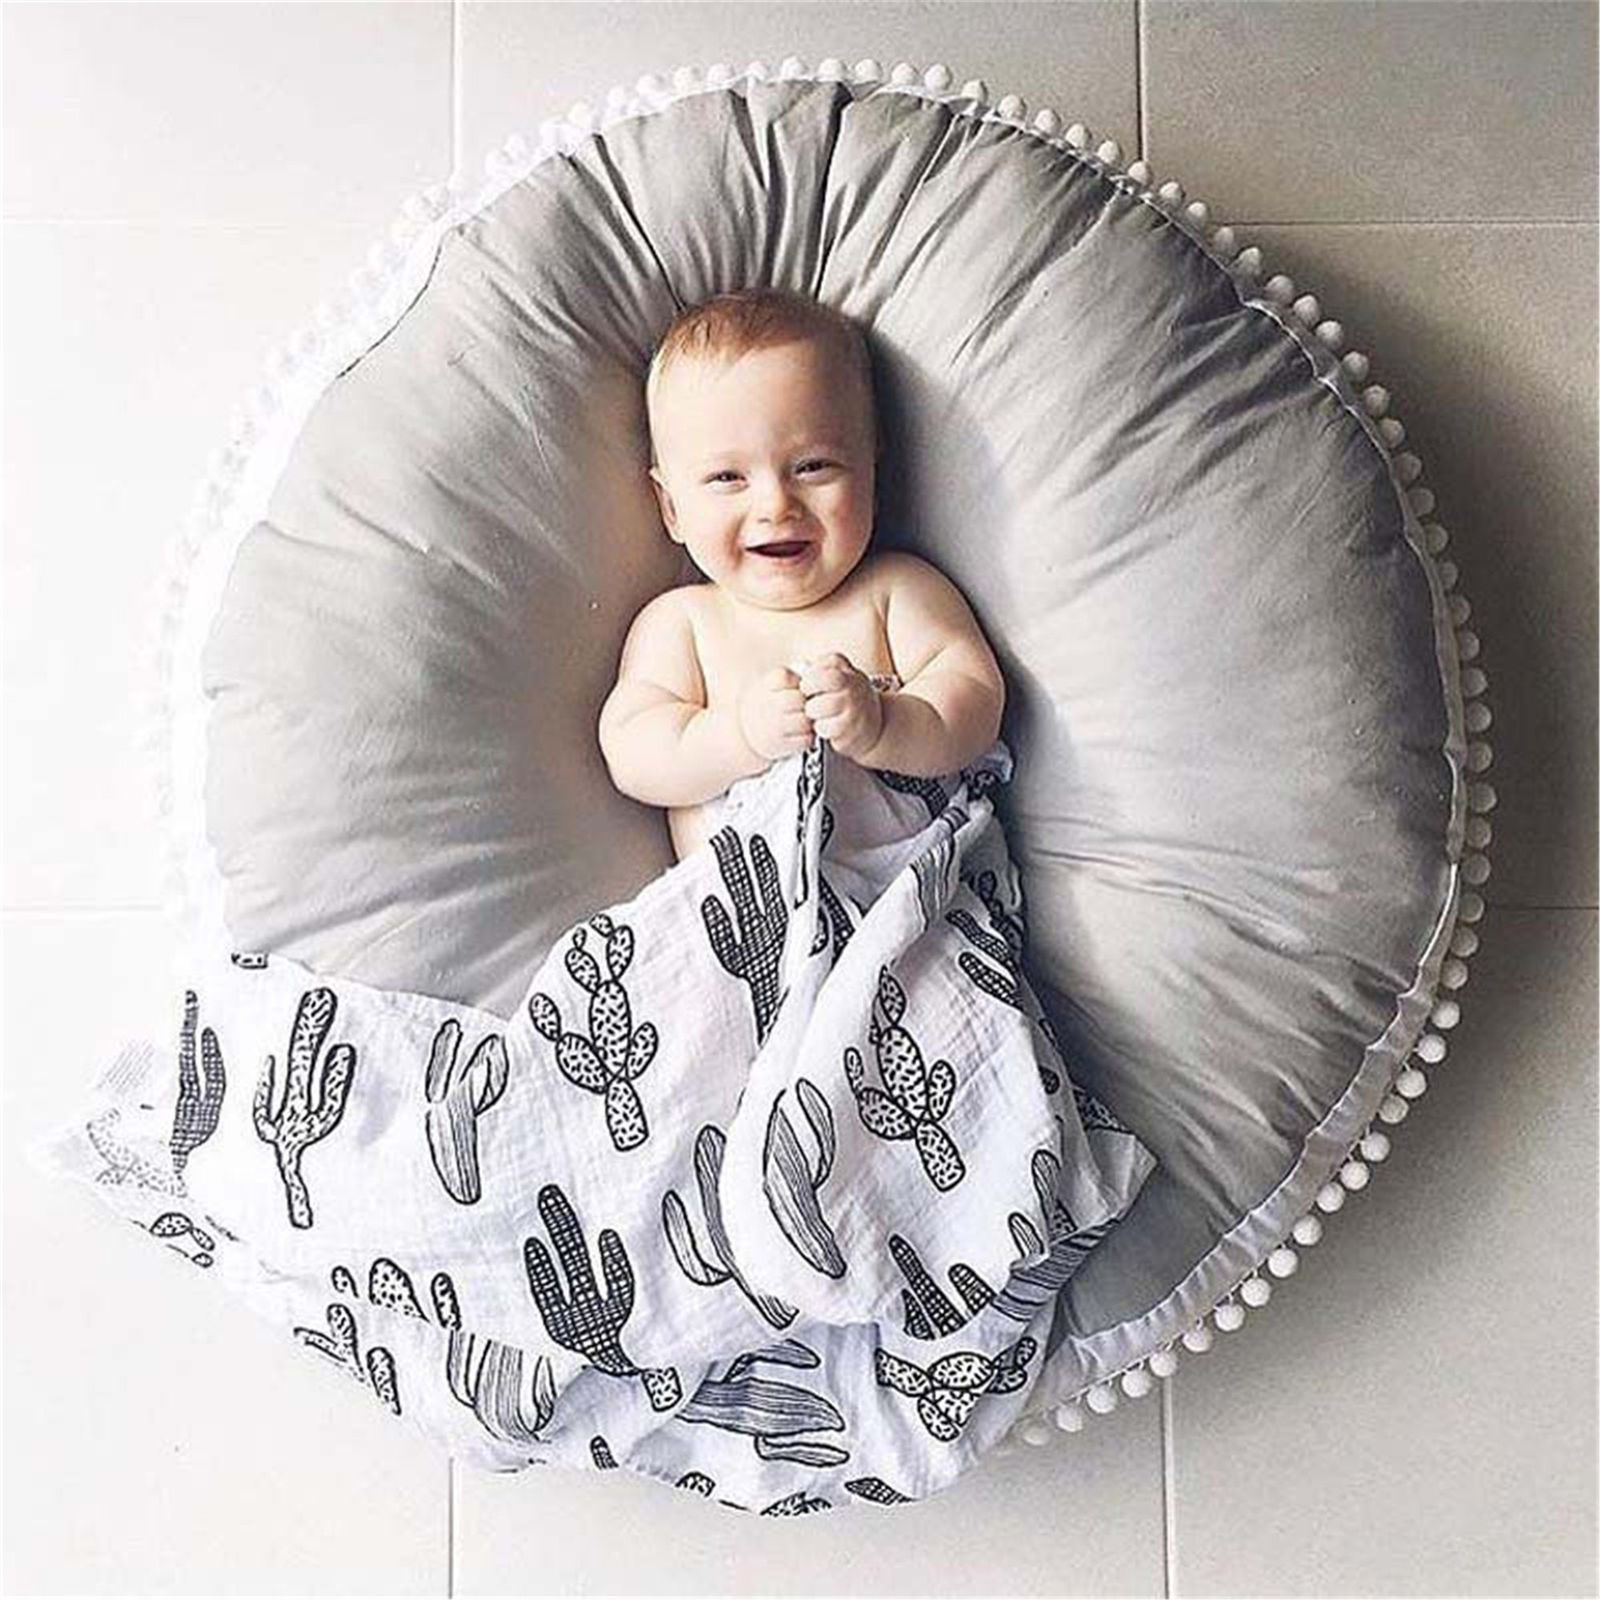 2019 Baby bean bag chair Cotton Round Soft Play Mats Crawling Pad Play Mat Home Children Kids Room Decor 90*90cm Yellow Grey